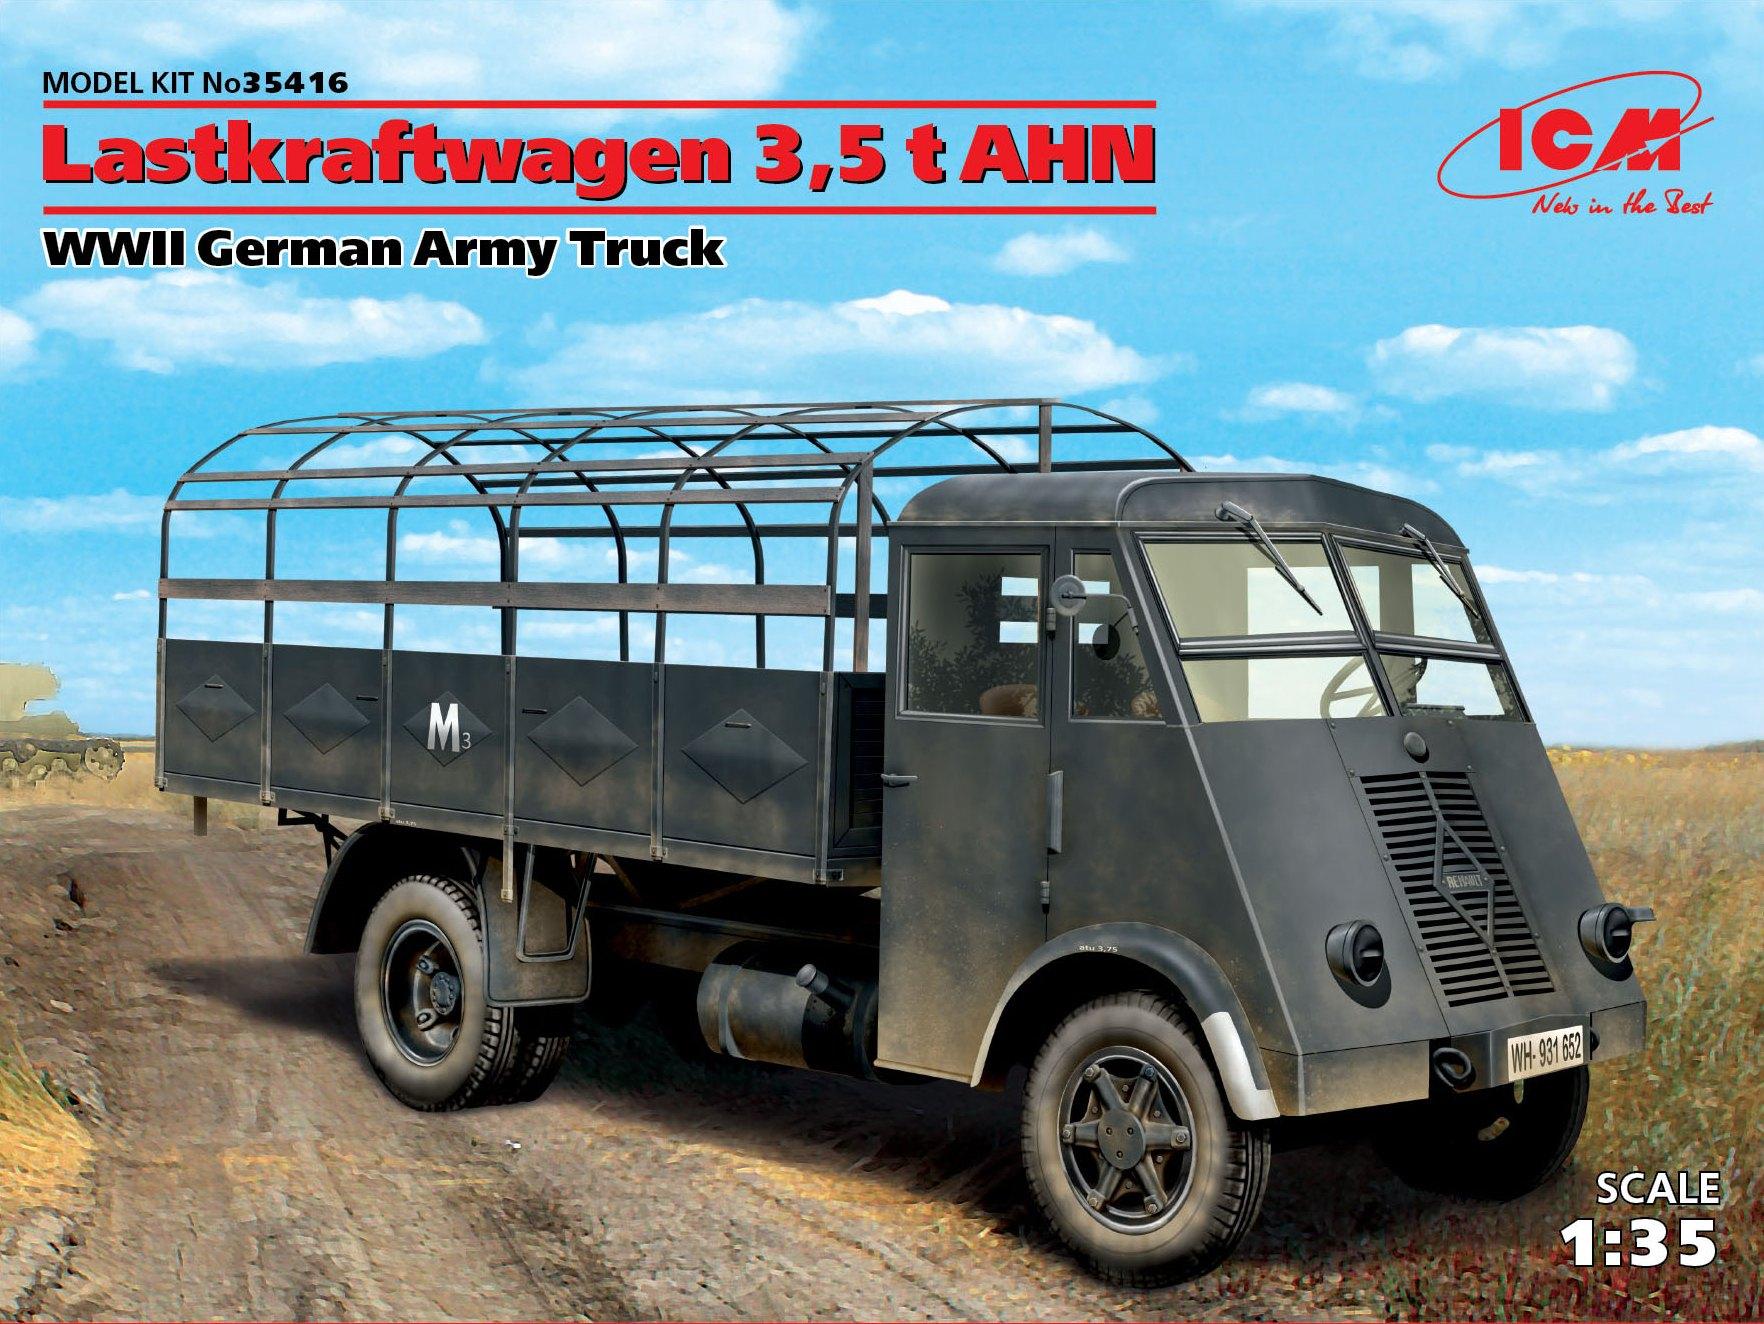 ICM Lastkraftwagen 3,5 t AHN, WWII German Army Truck